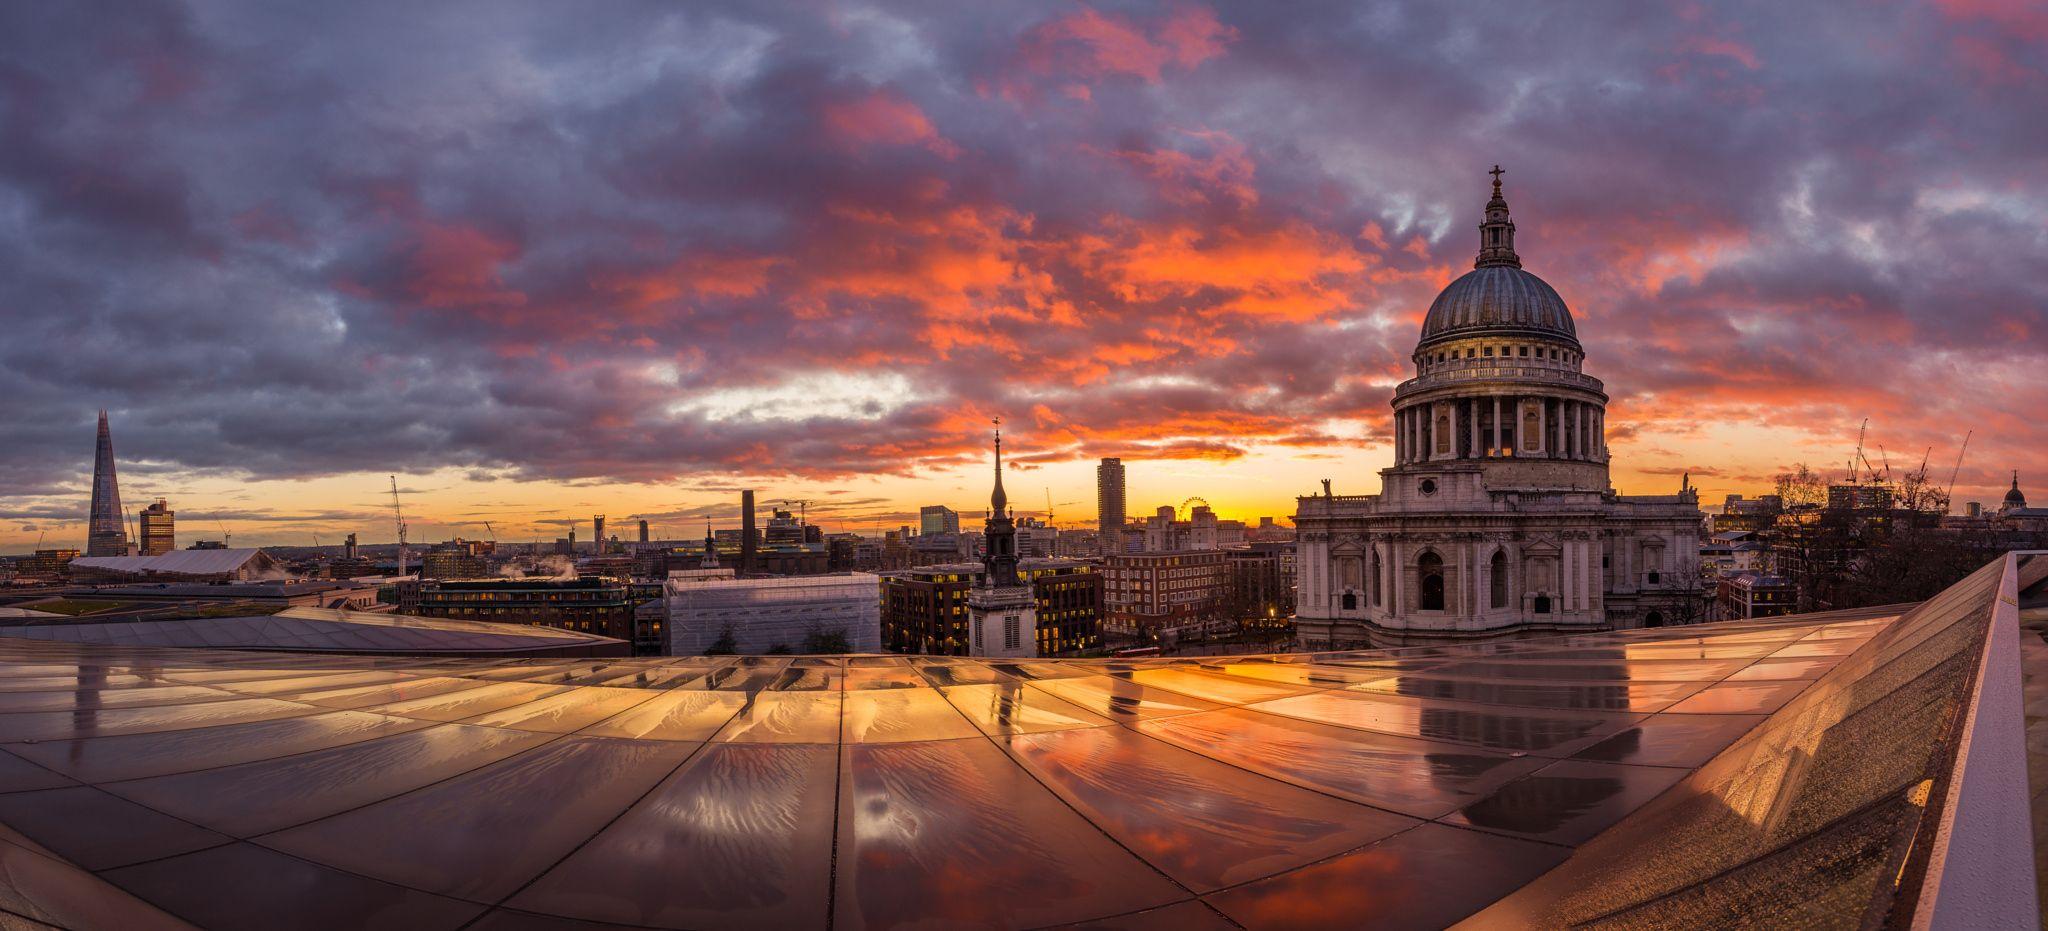 Sundown - St Paul's from One New Change St Paul's ...